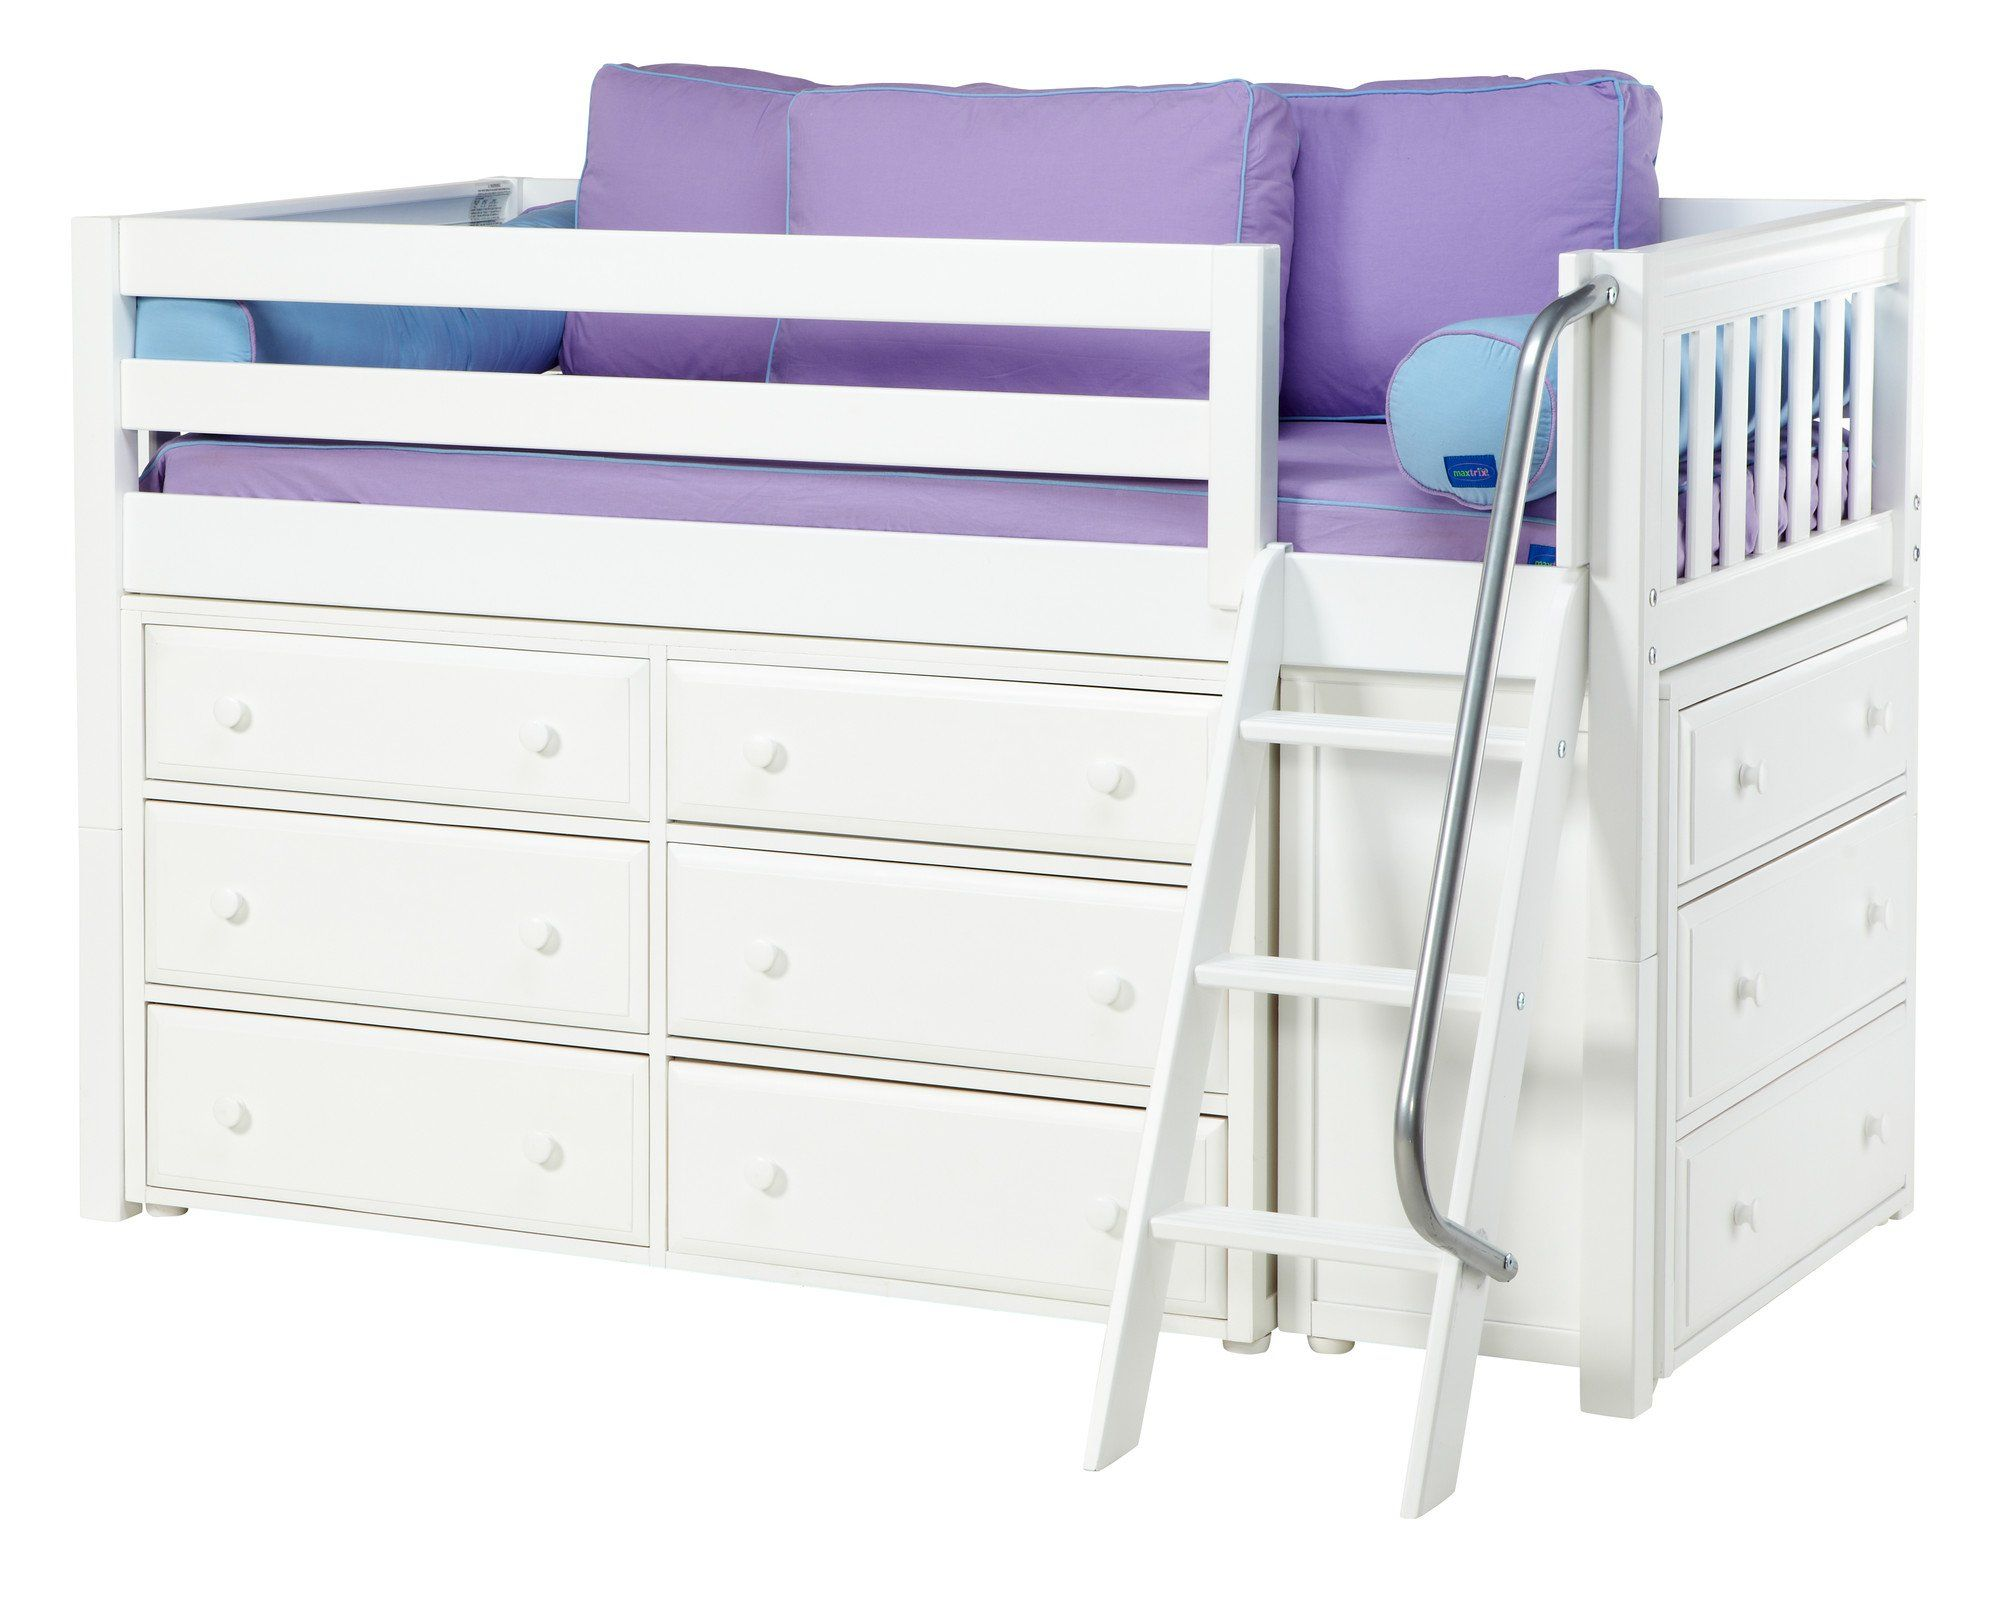 Best Amazon Com Wildon Home ® Kicks2 Low Loft Slat Bed With Angle Ladder And 6 Drawer Dresser 400 x 300